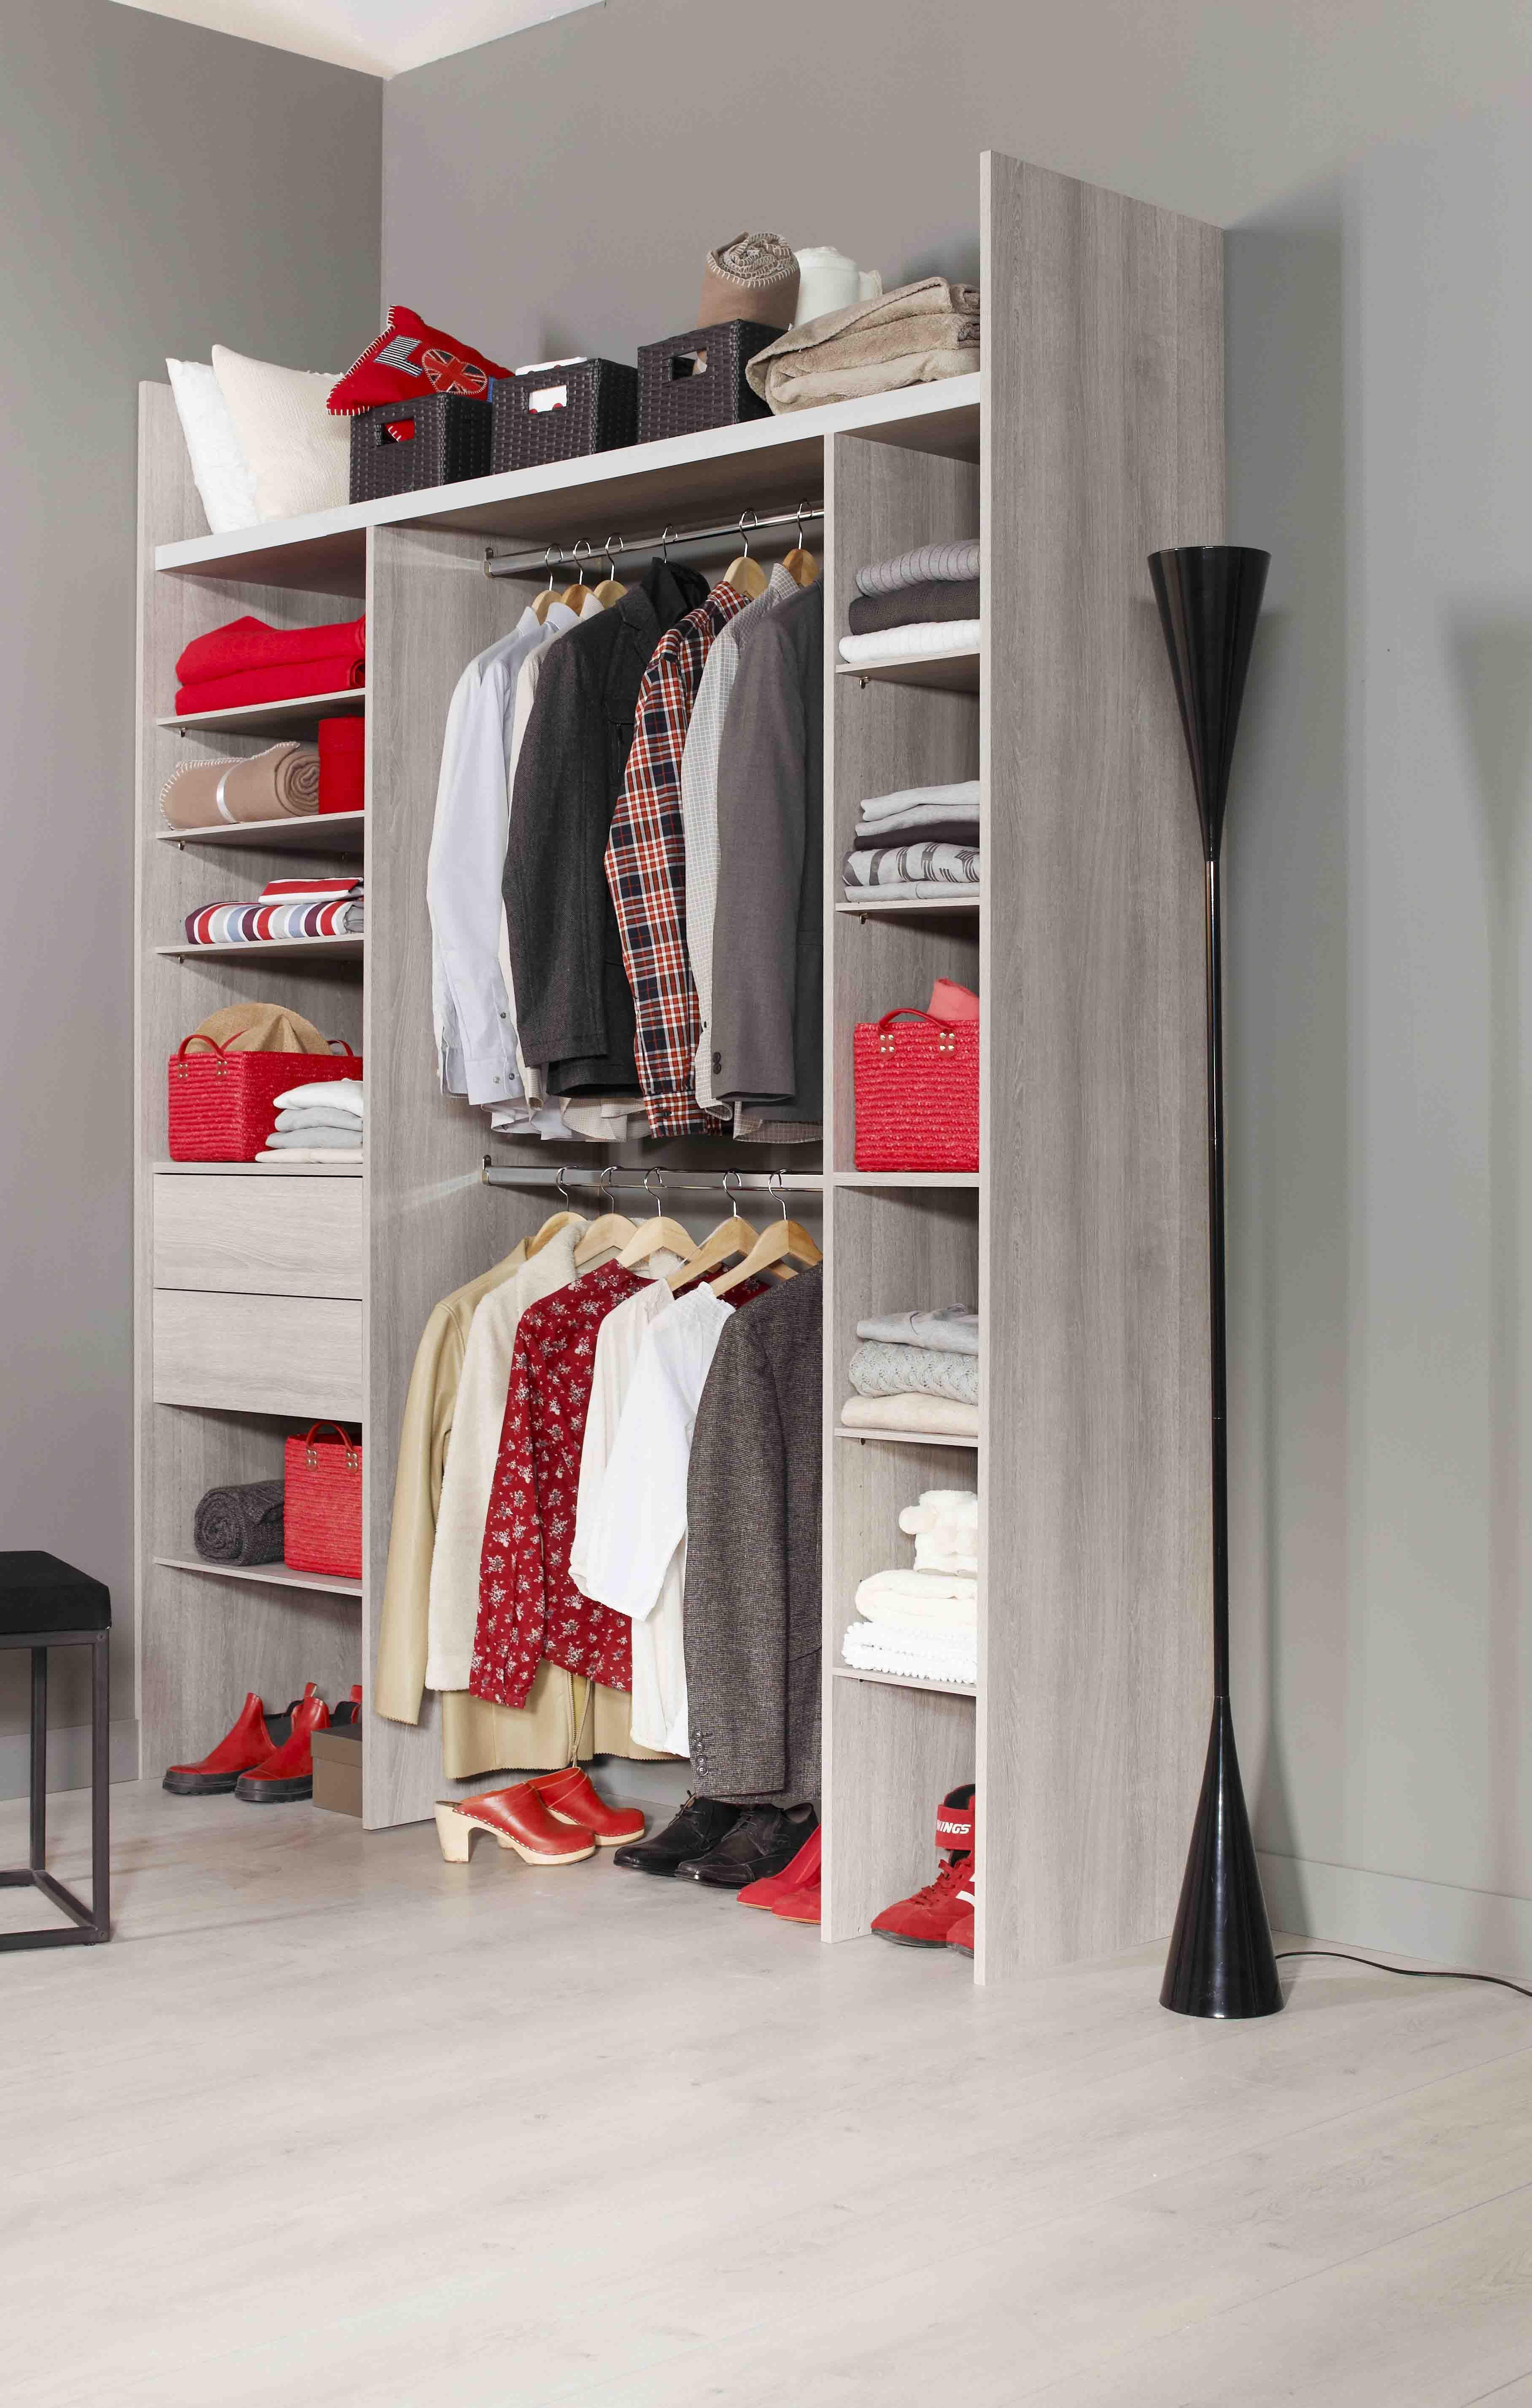 pingl par clara geara sur decoracion de interior. Black Bedroom Furniture Sets. Home Design Ideas